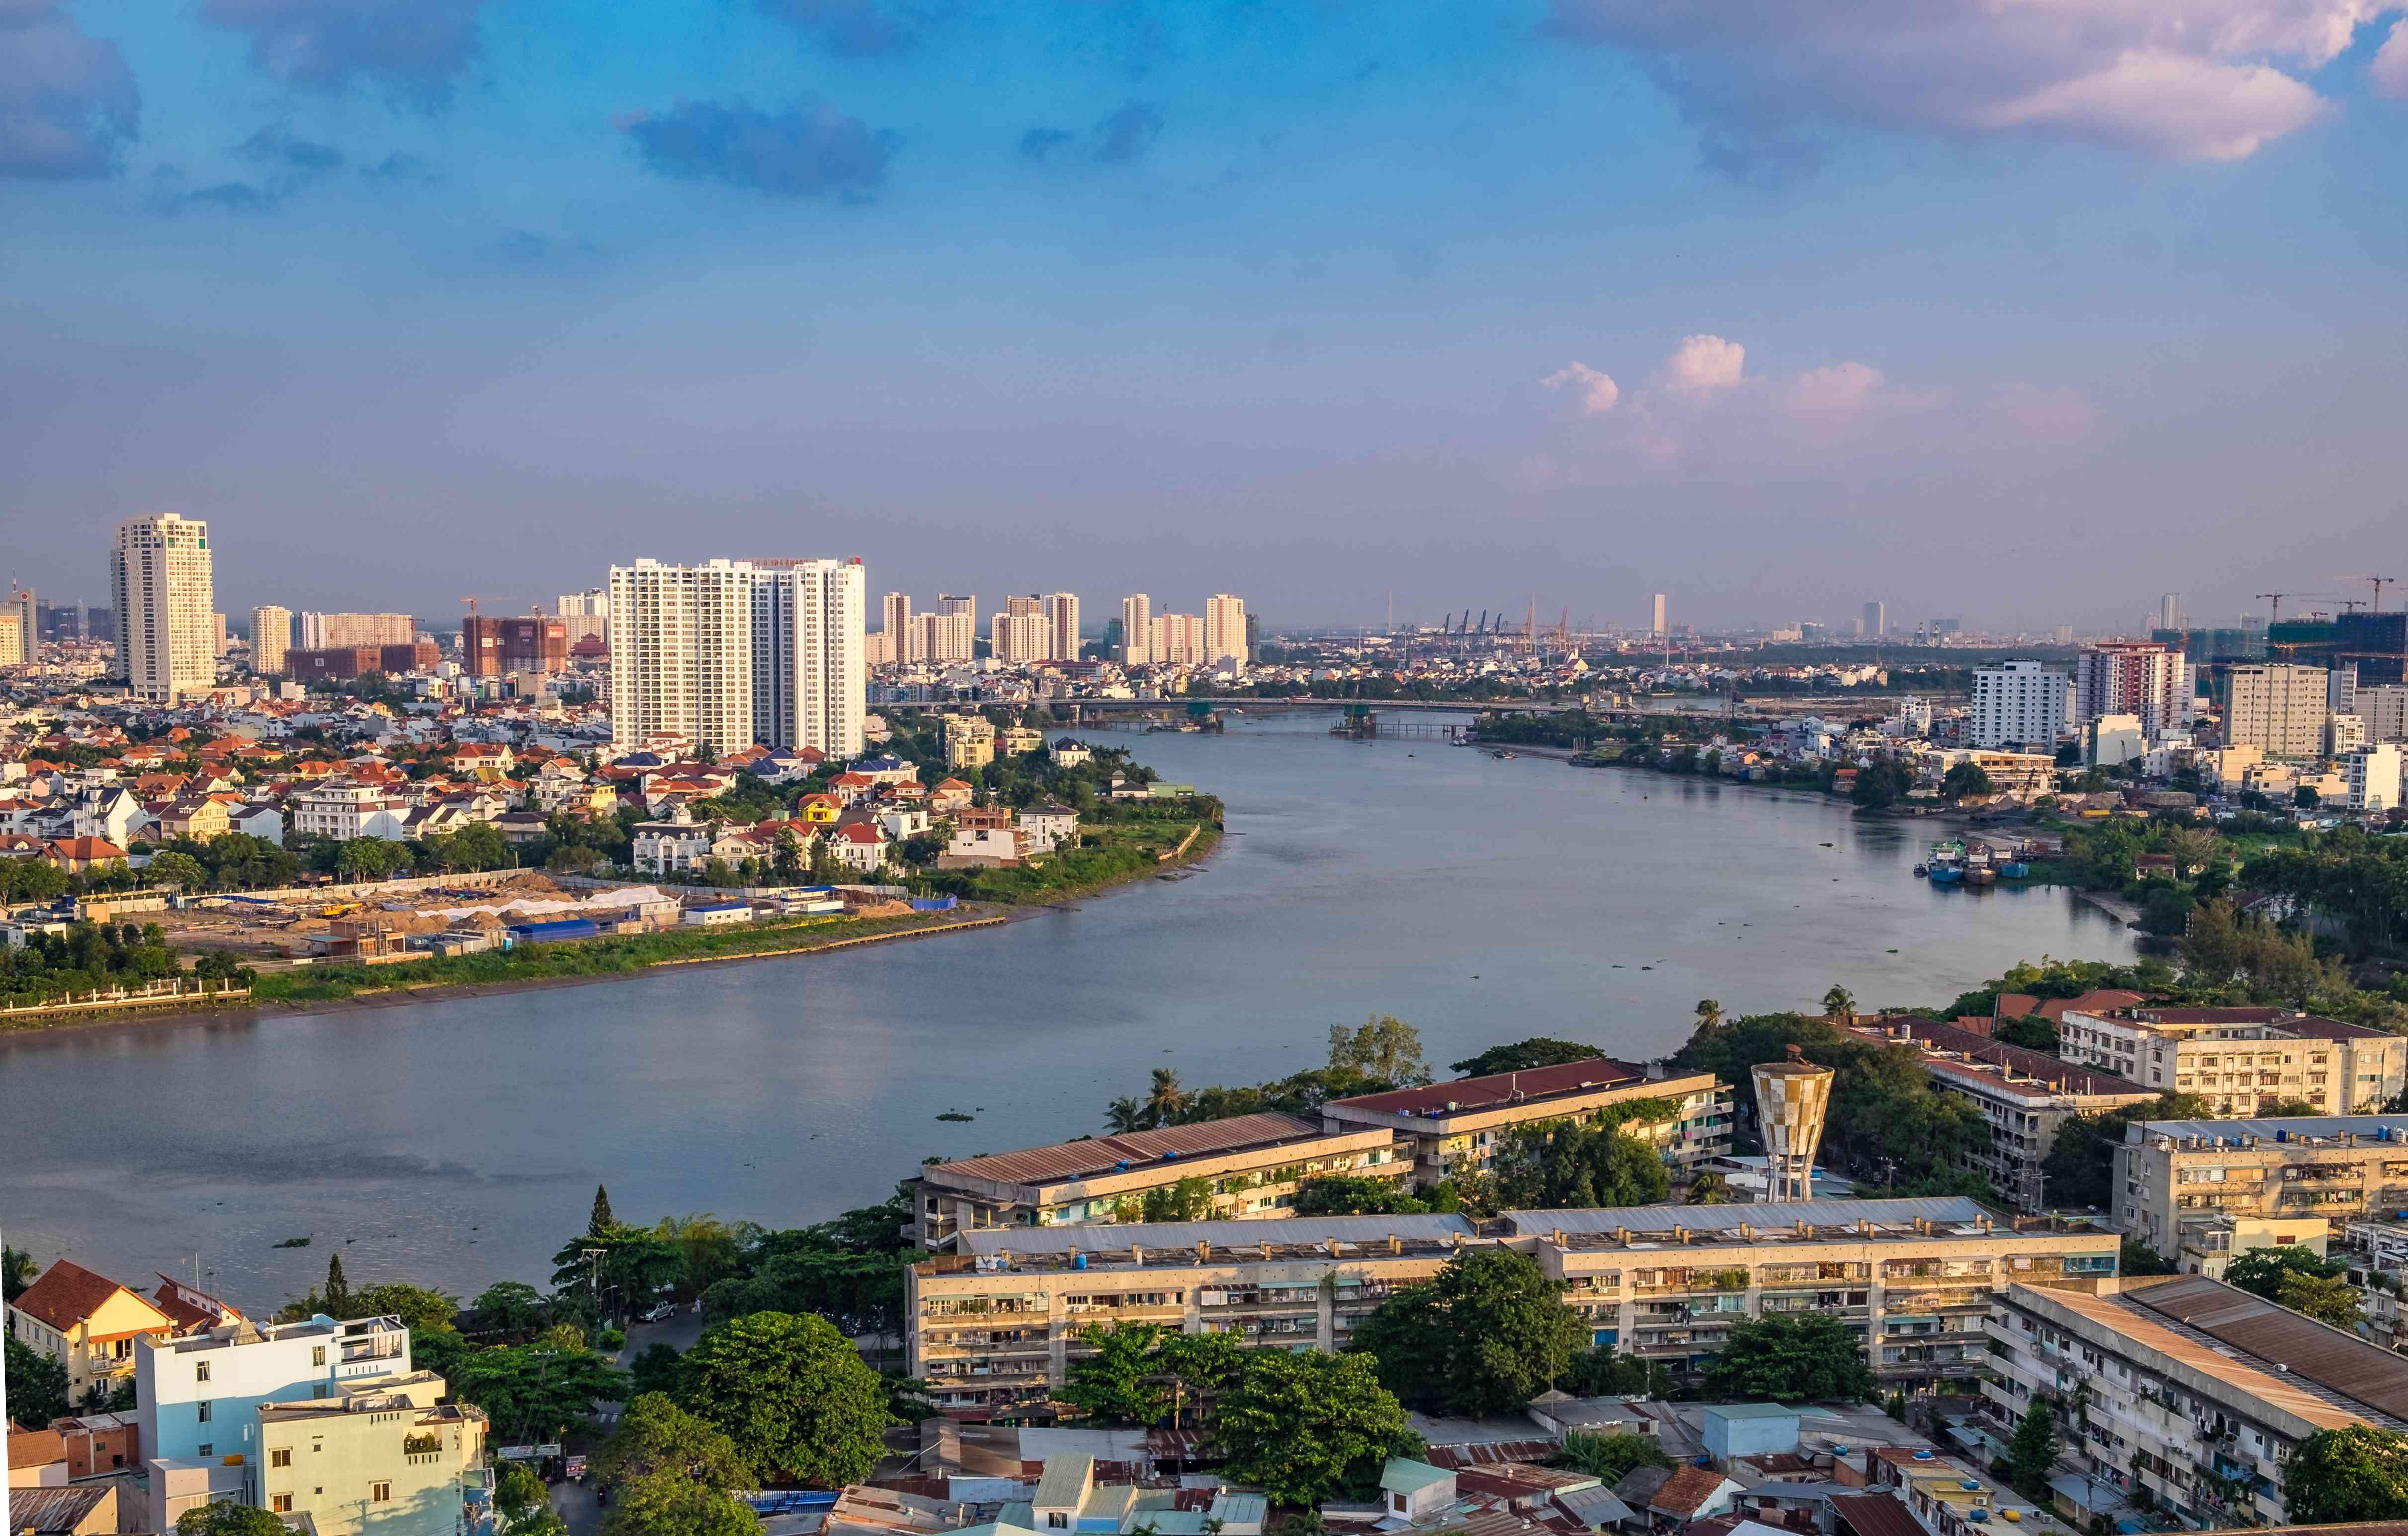 Condos and the Saigon River by Thao Dien